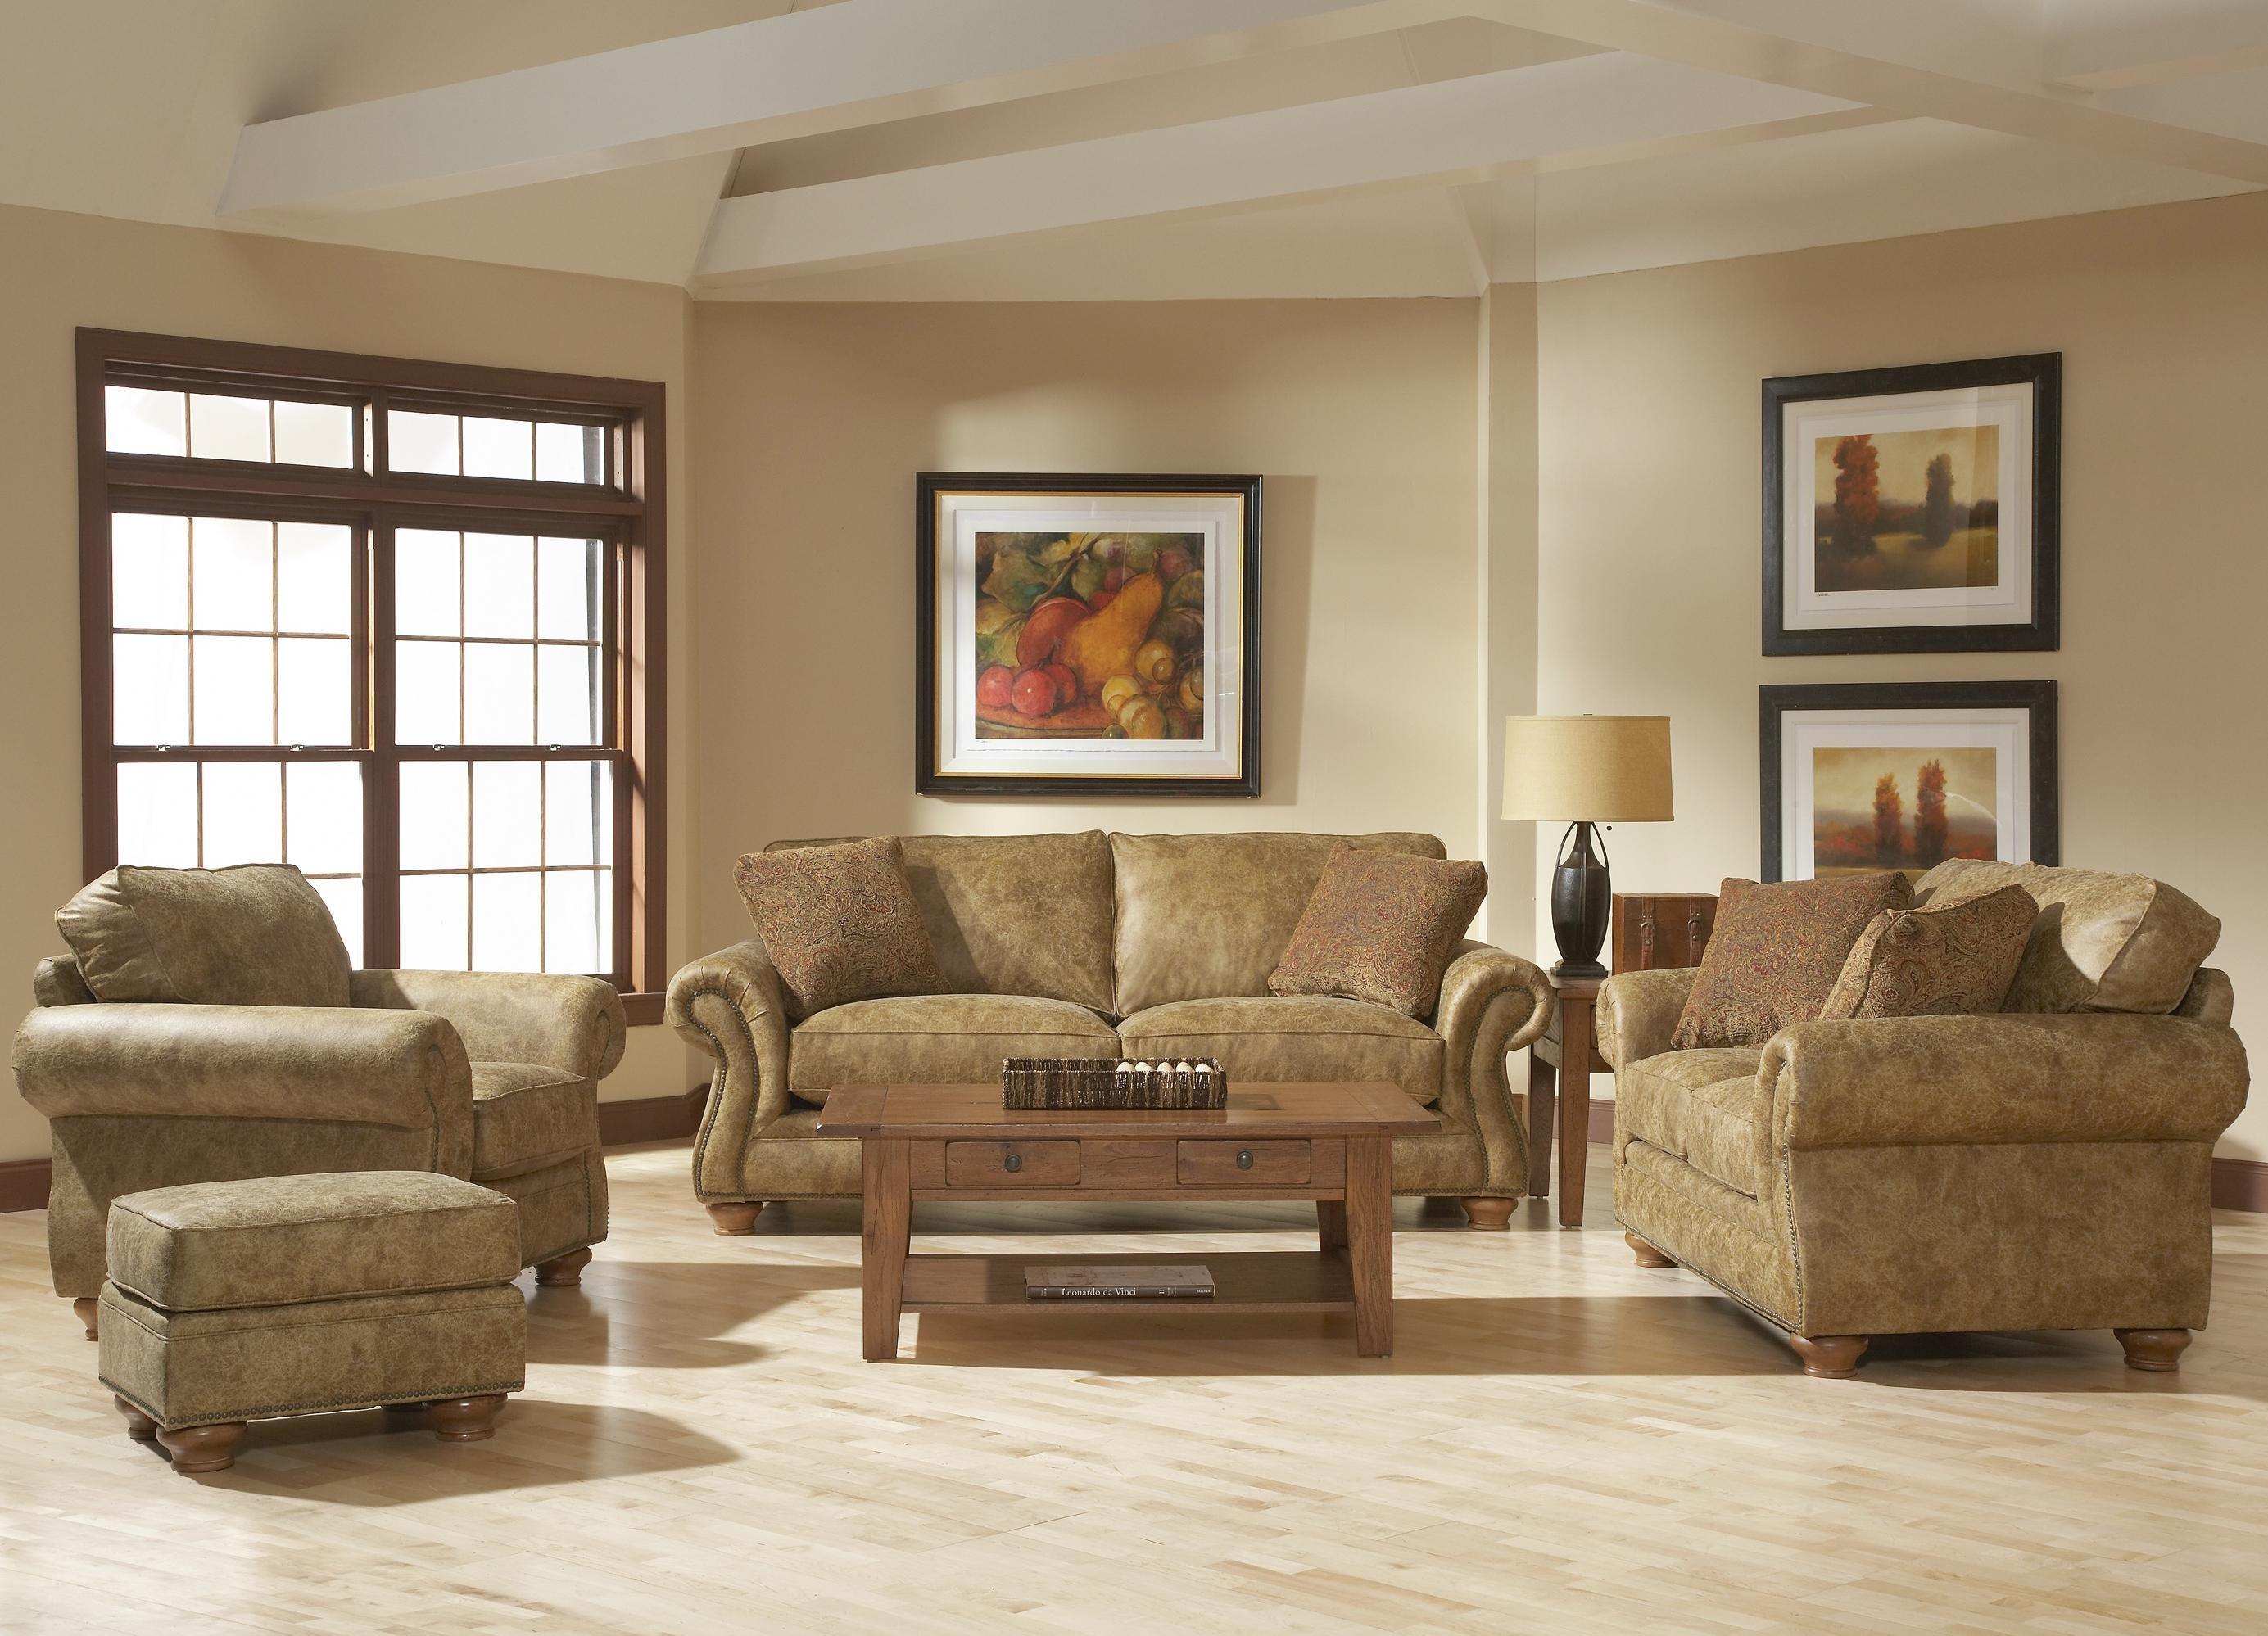 Broyhill Furniture Laramie 3 Piece Wedge Sectional Sofa – Wayside Regarding Broyhill Sectional Sofas (View 15 of 15)